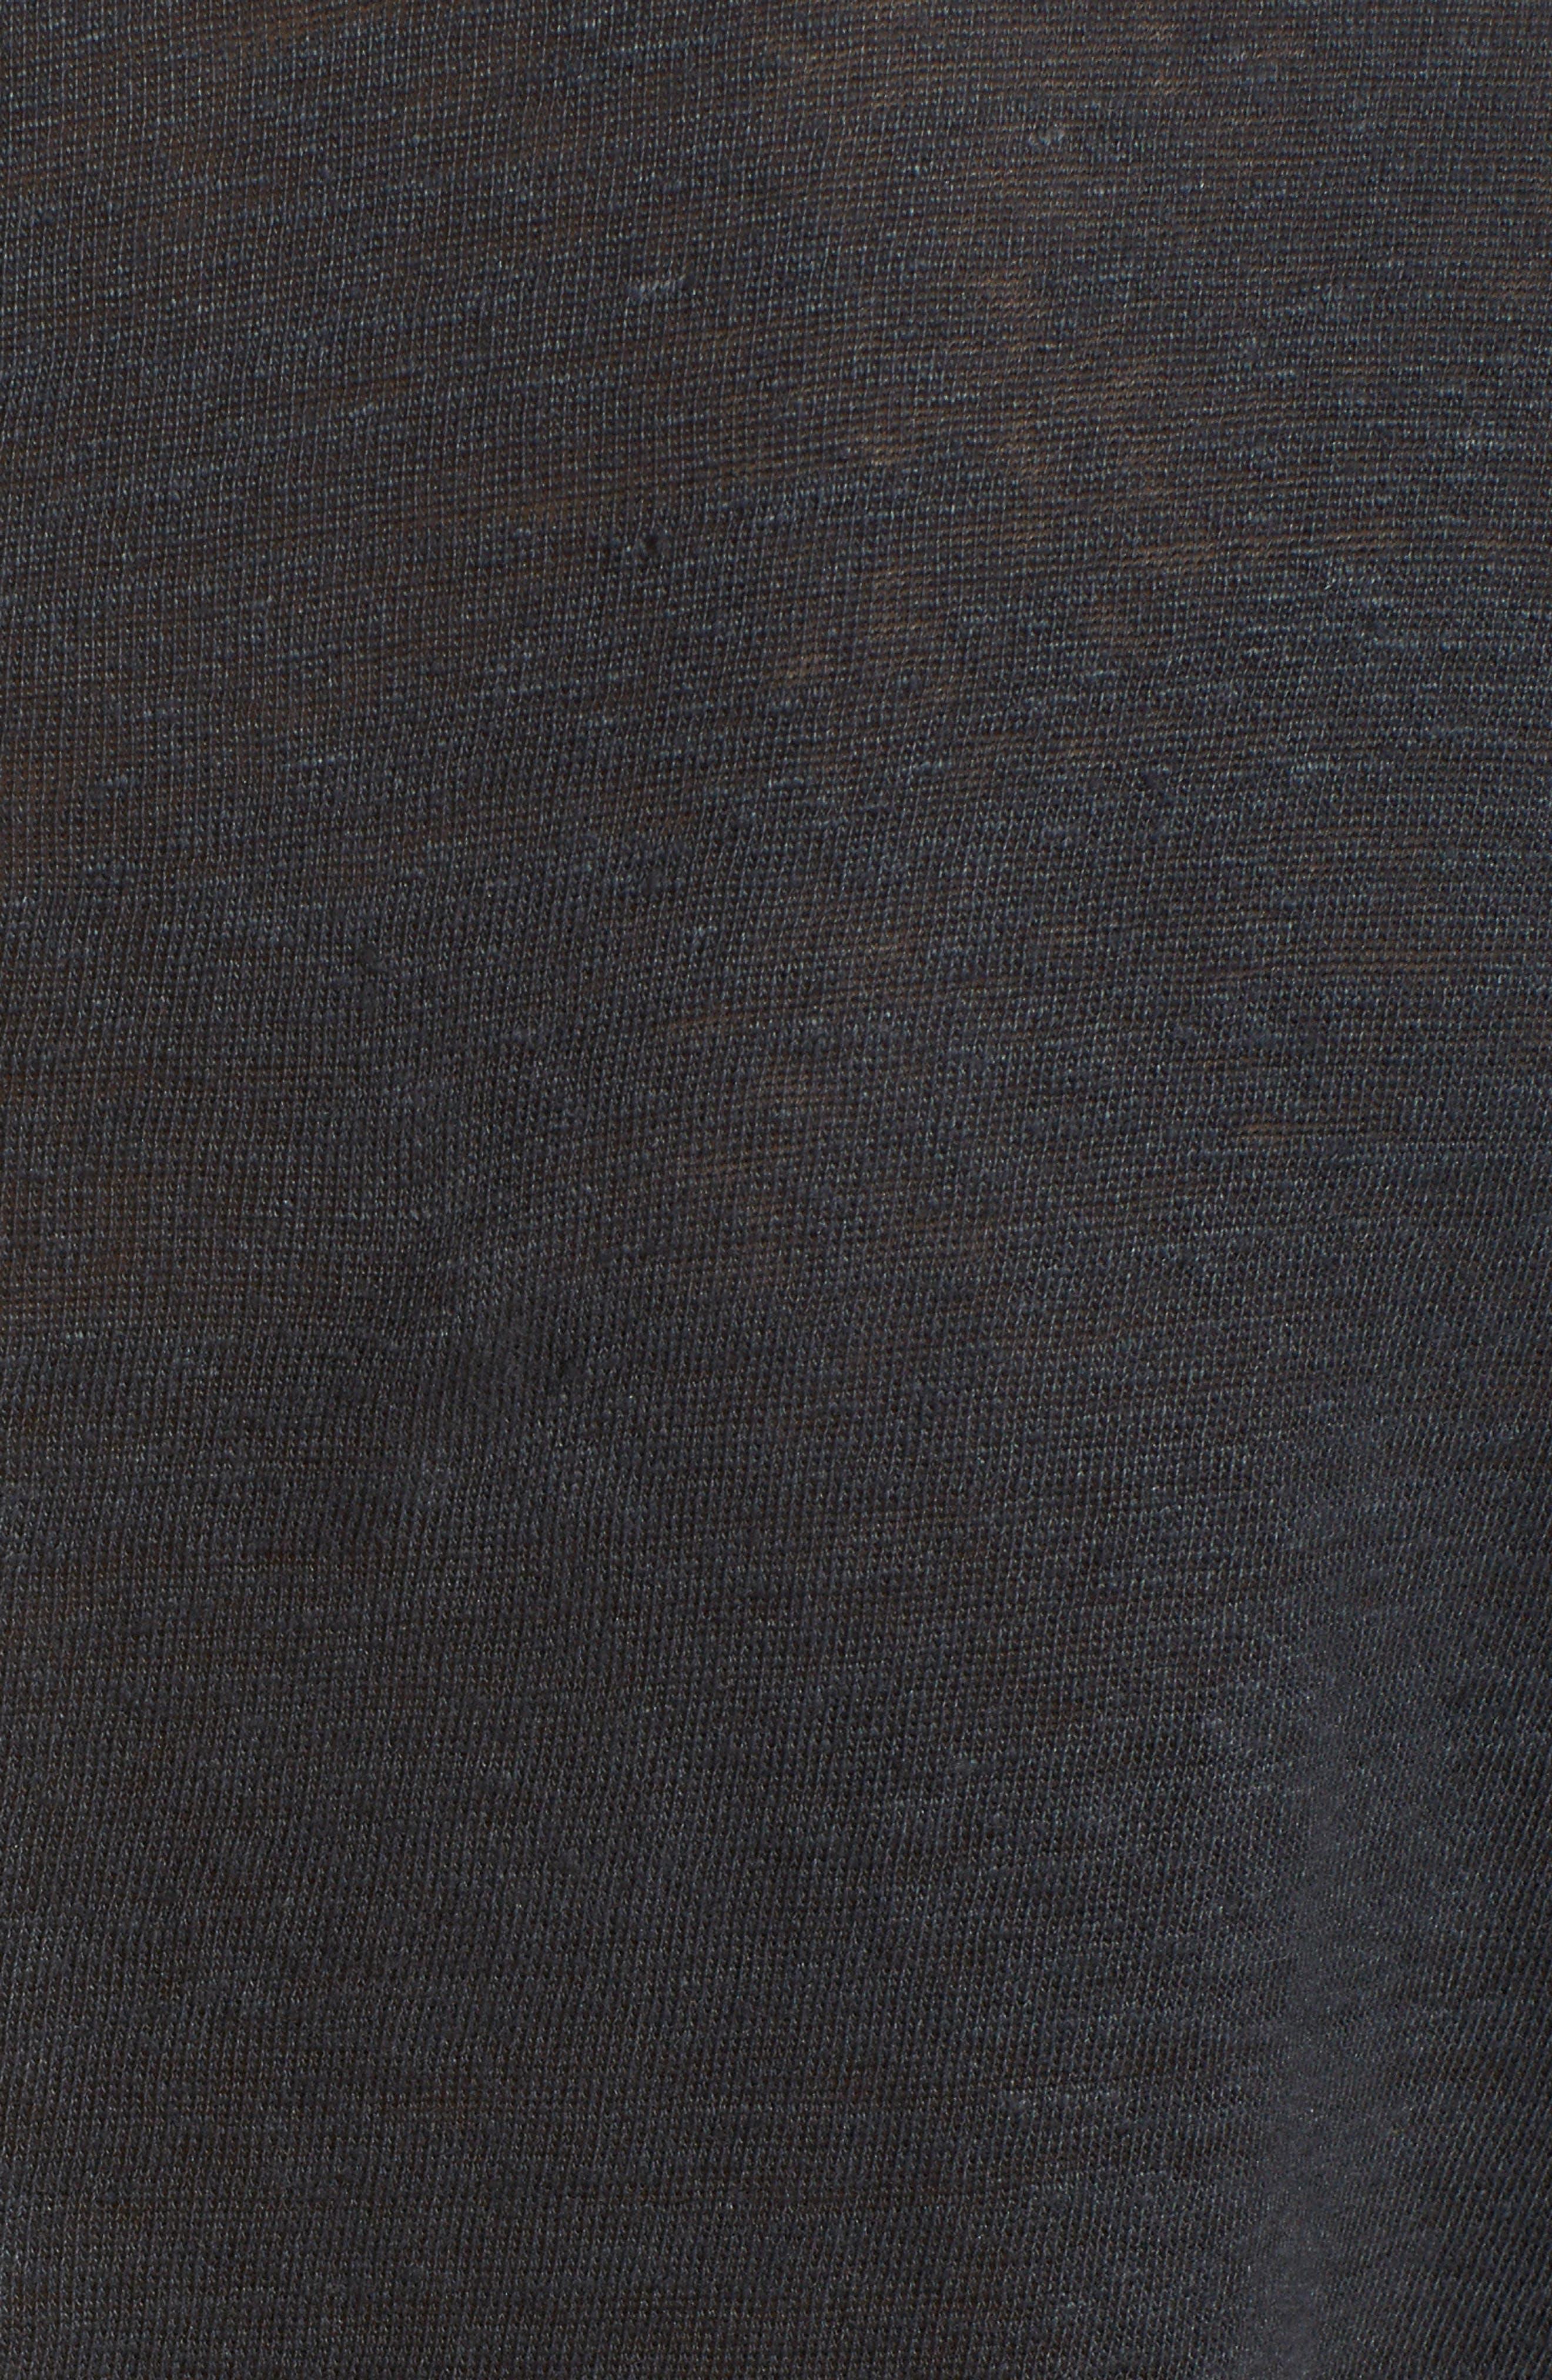 Owen Slub Linen T-Shirt,                             Alternate thumbnail 5, color,                             001